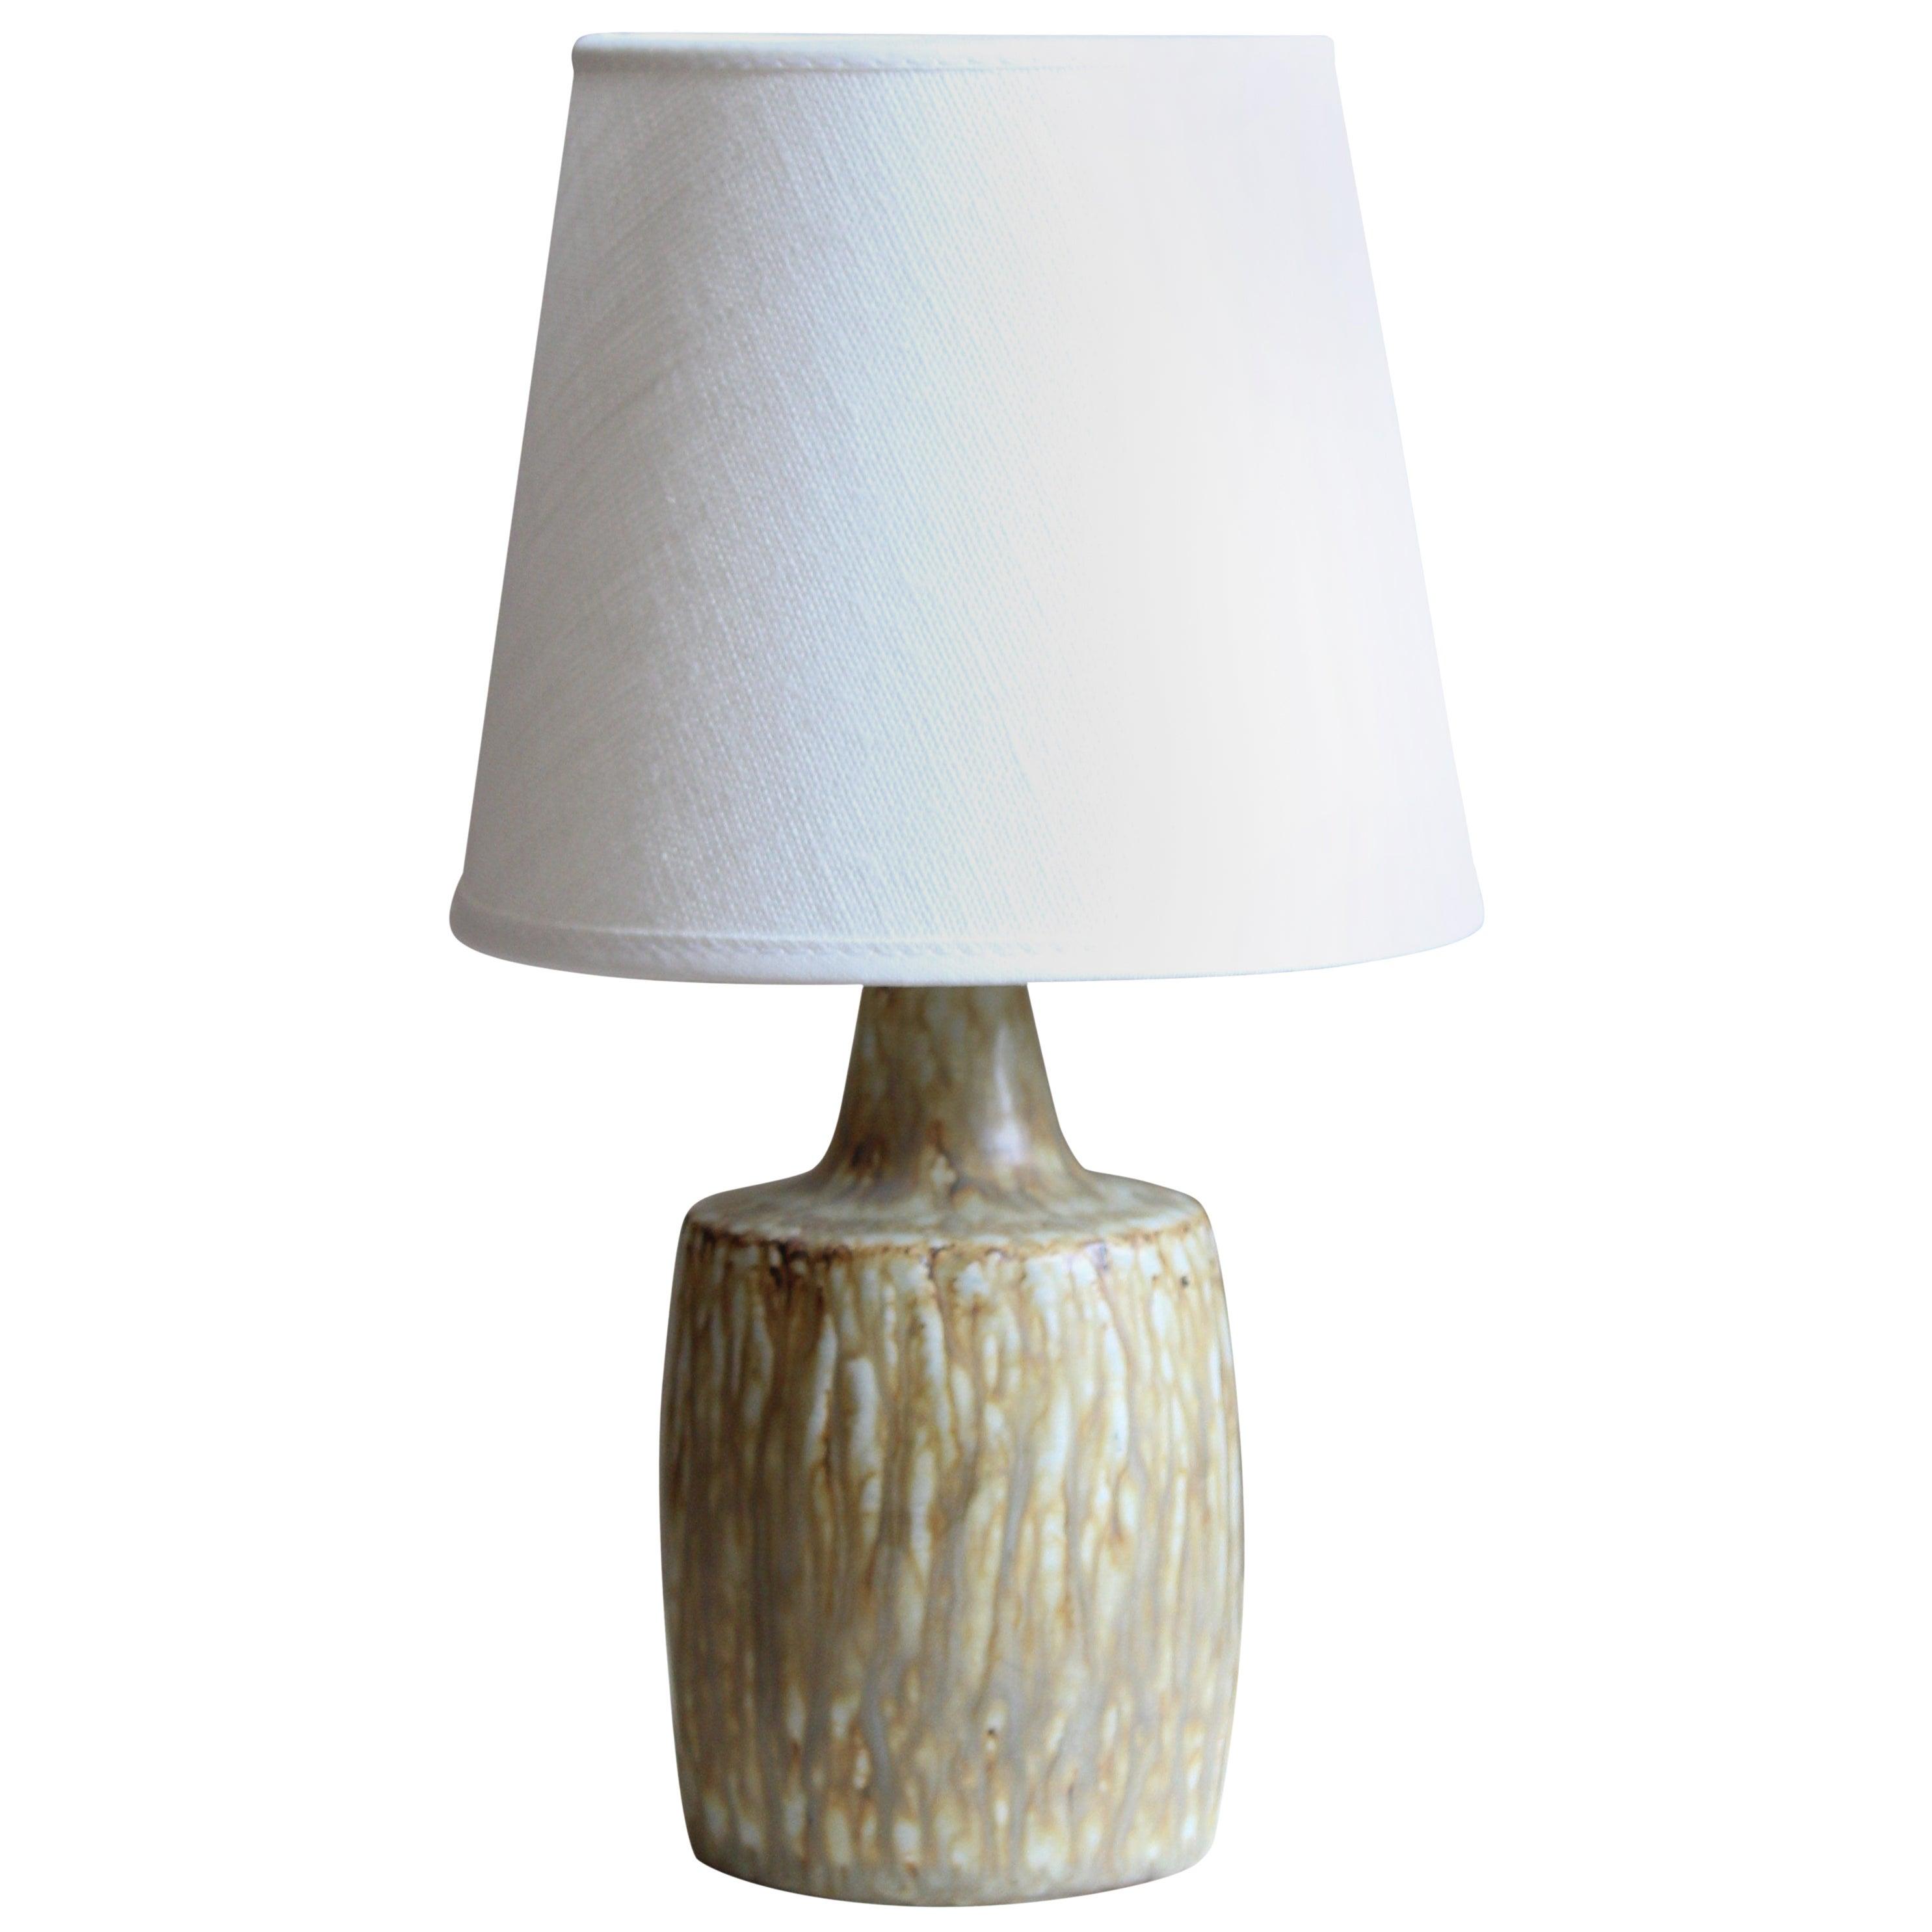 Gunnar Nylund, Small Table Lamp, Glazed Stoneware, Linen Rörstand, Sweden, 1950s